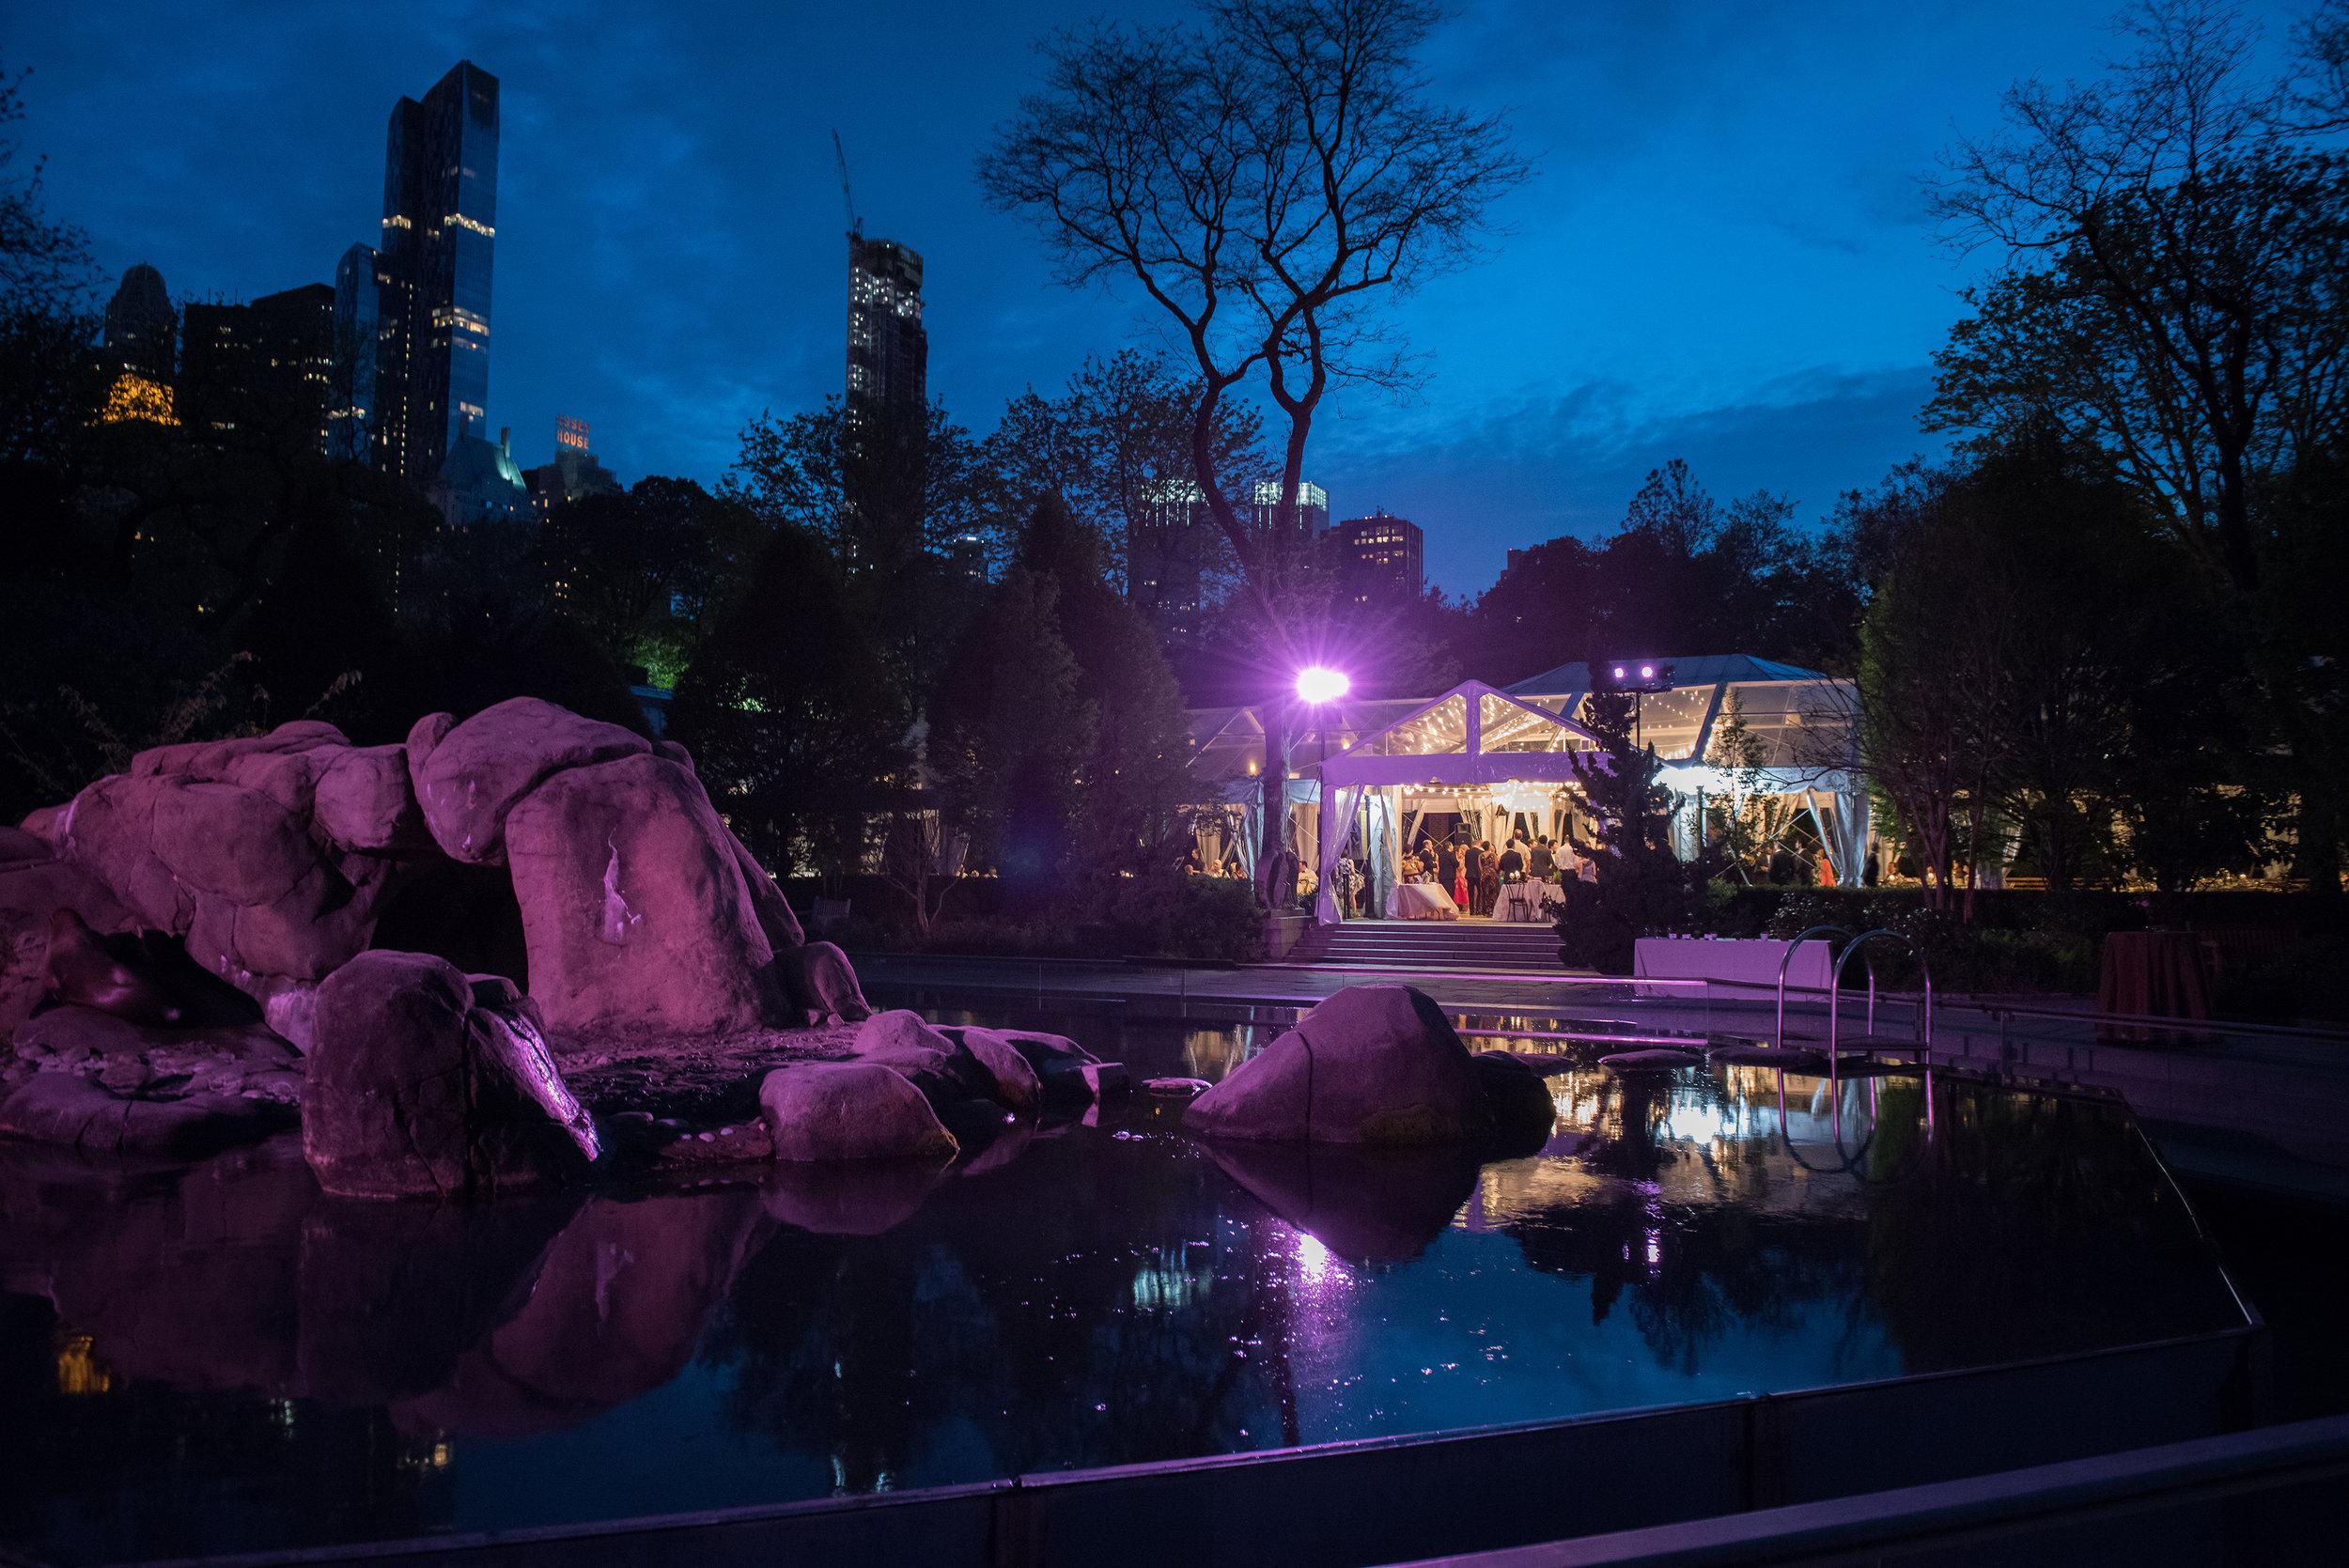 victorious-events-nyc-033-colleen-taka-central-park-zoo-wedding-raymond-hamlin.jpg